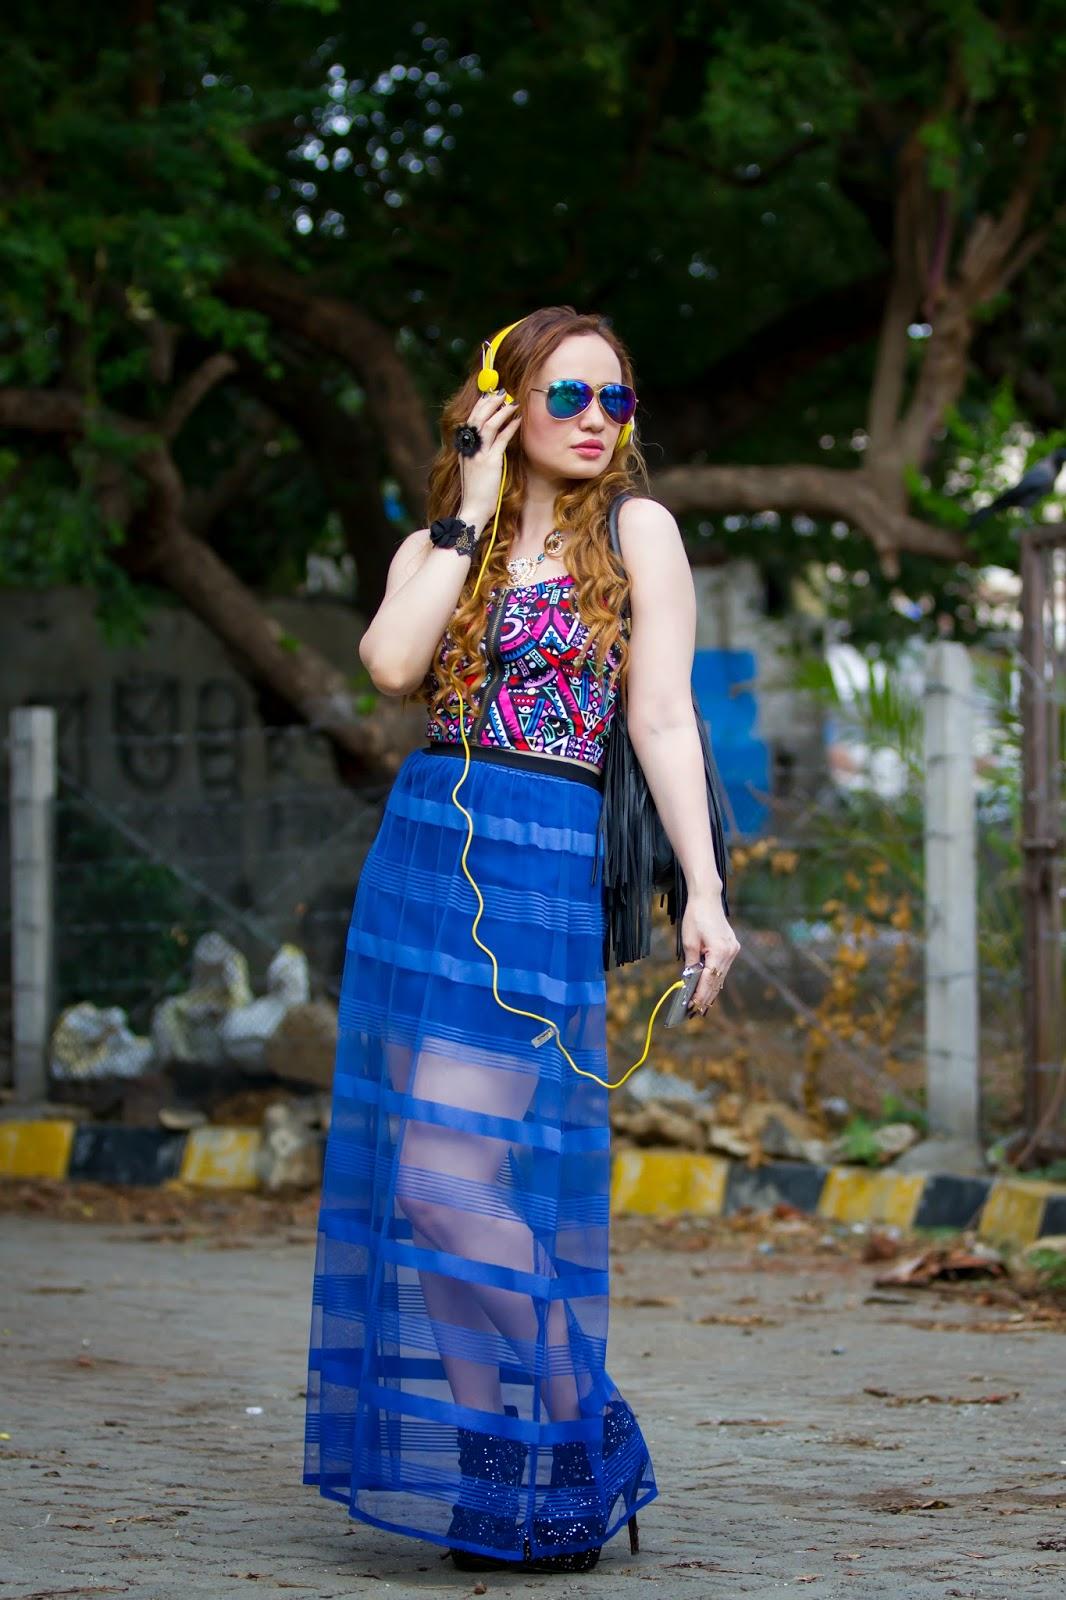 Gemoetric Crop Top & Sheer Maxi Skirt